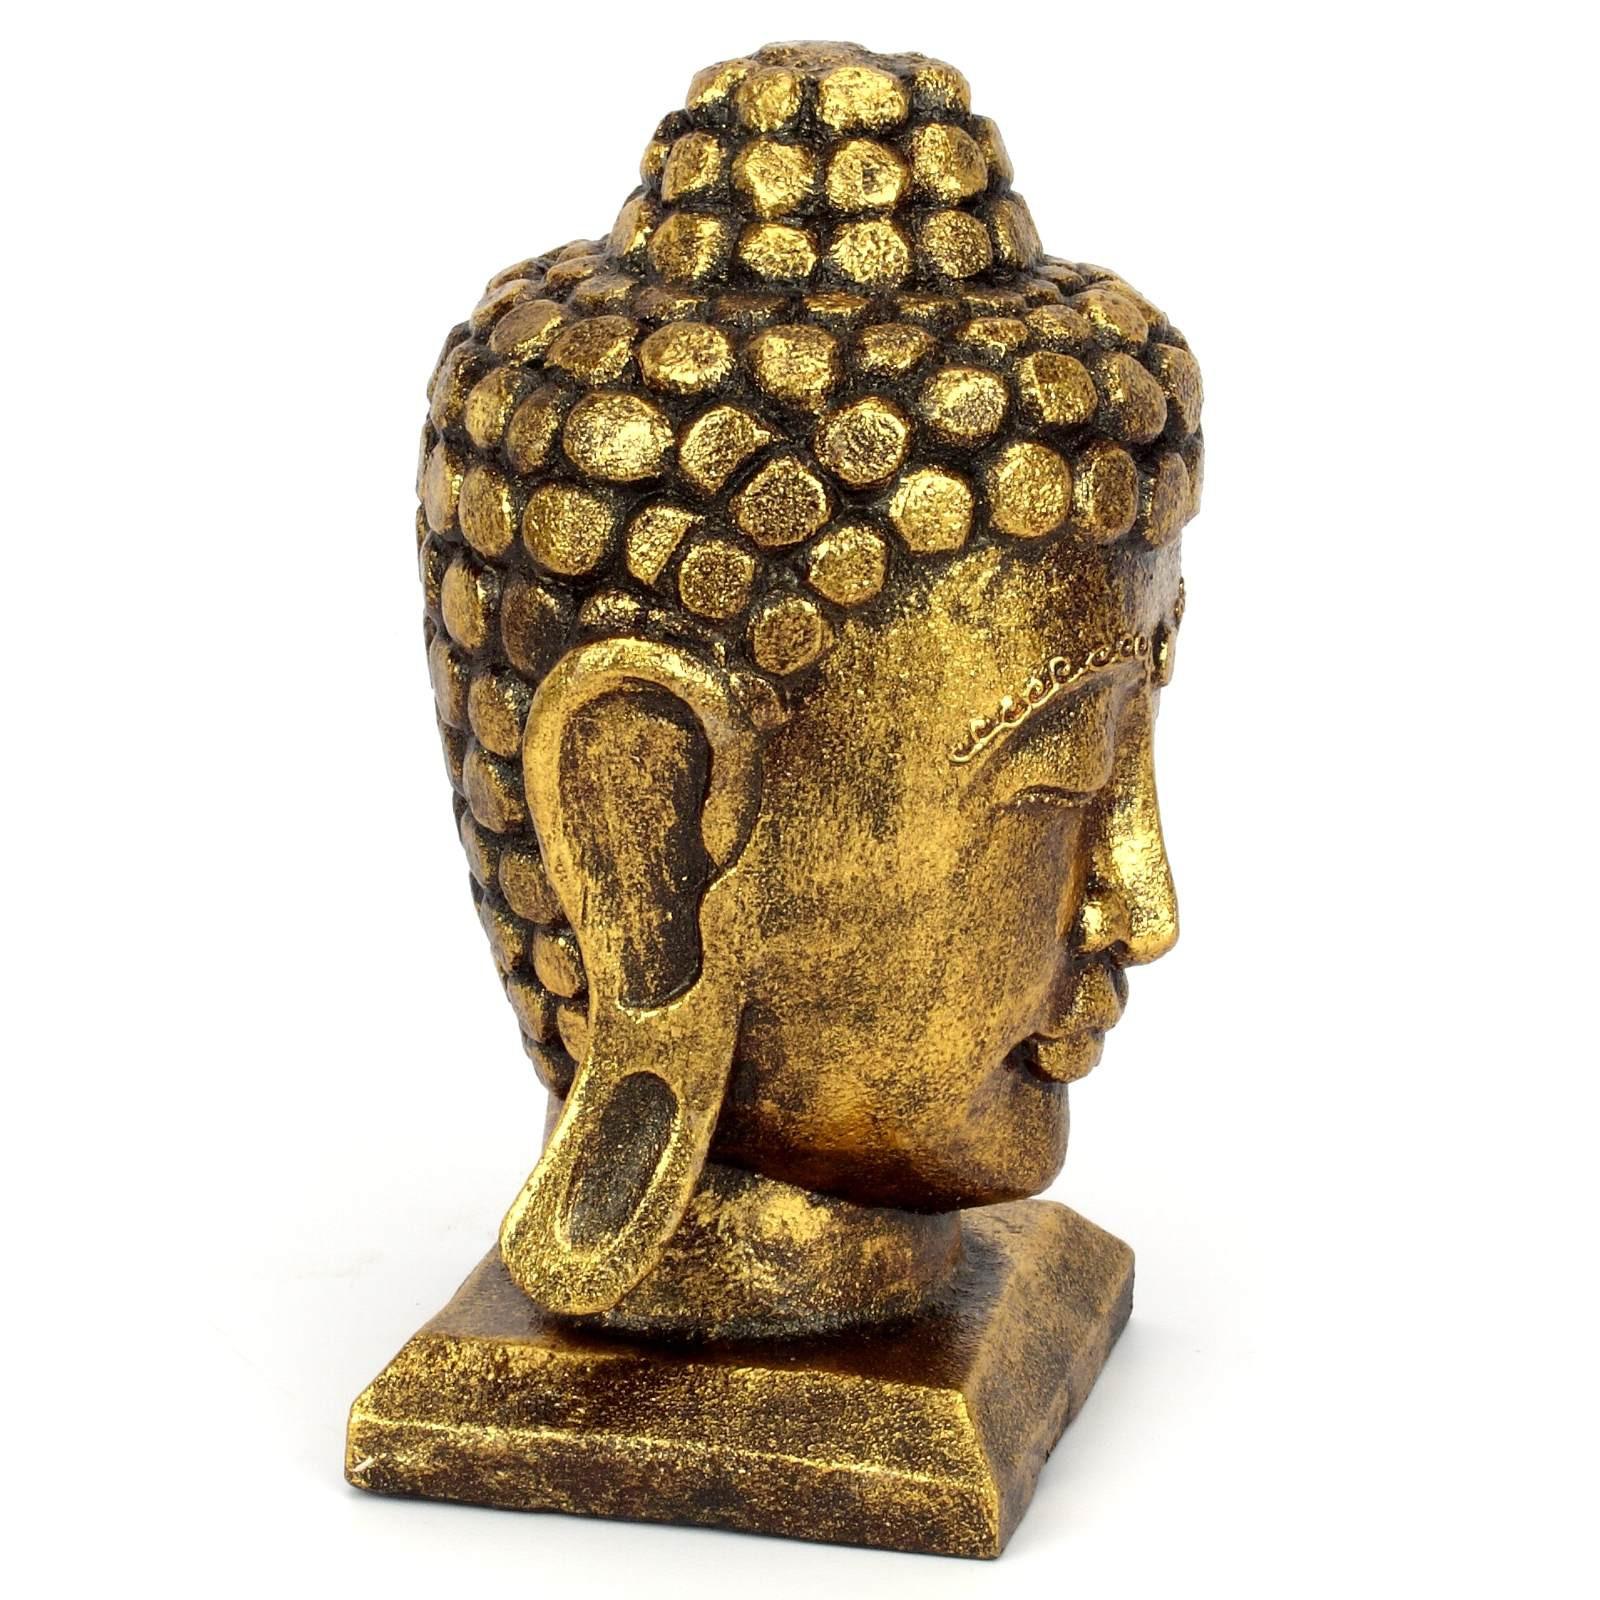 Buddha kopf figur aus holz gr s 25 cm gold 118783 for Buddha figur holz